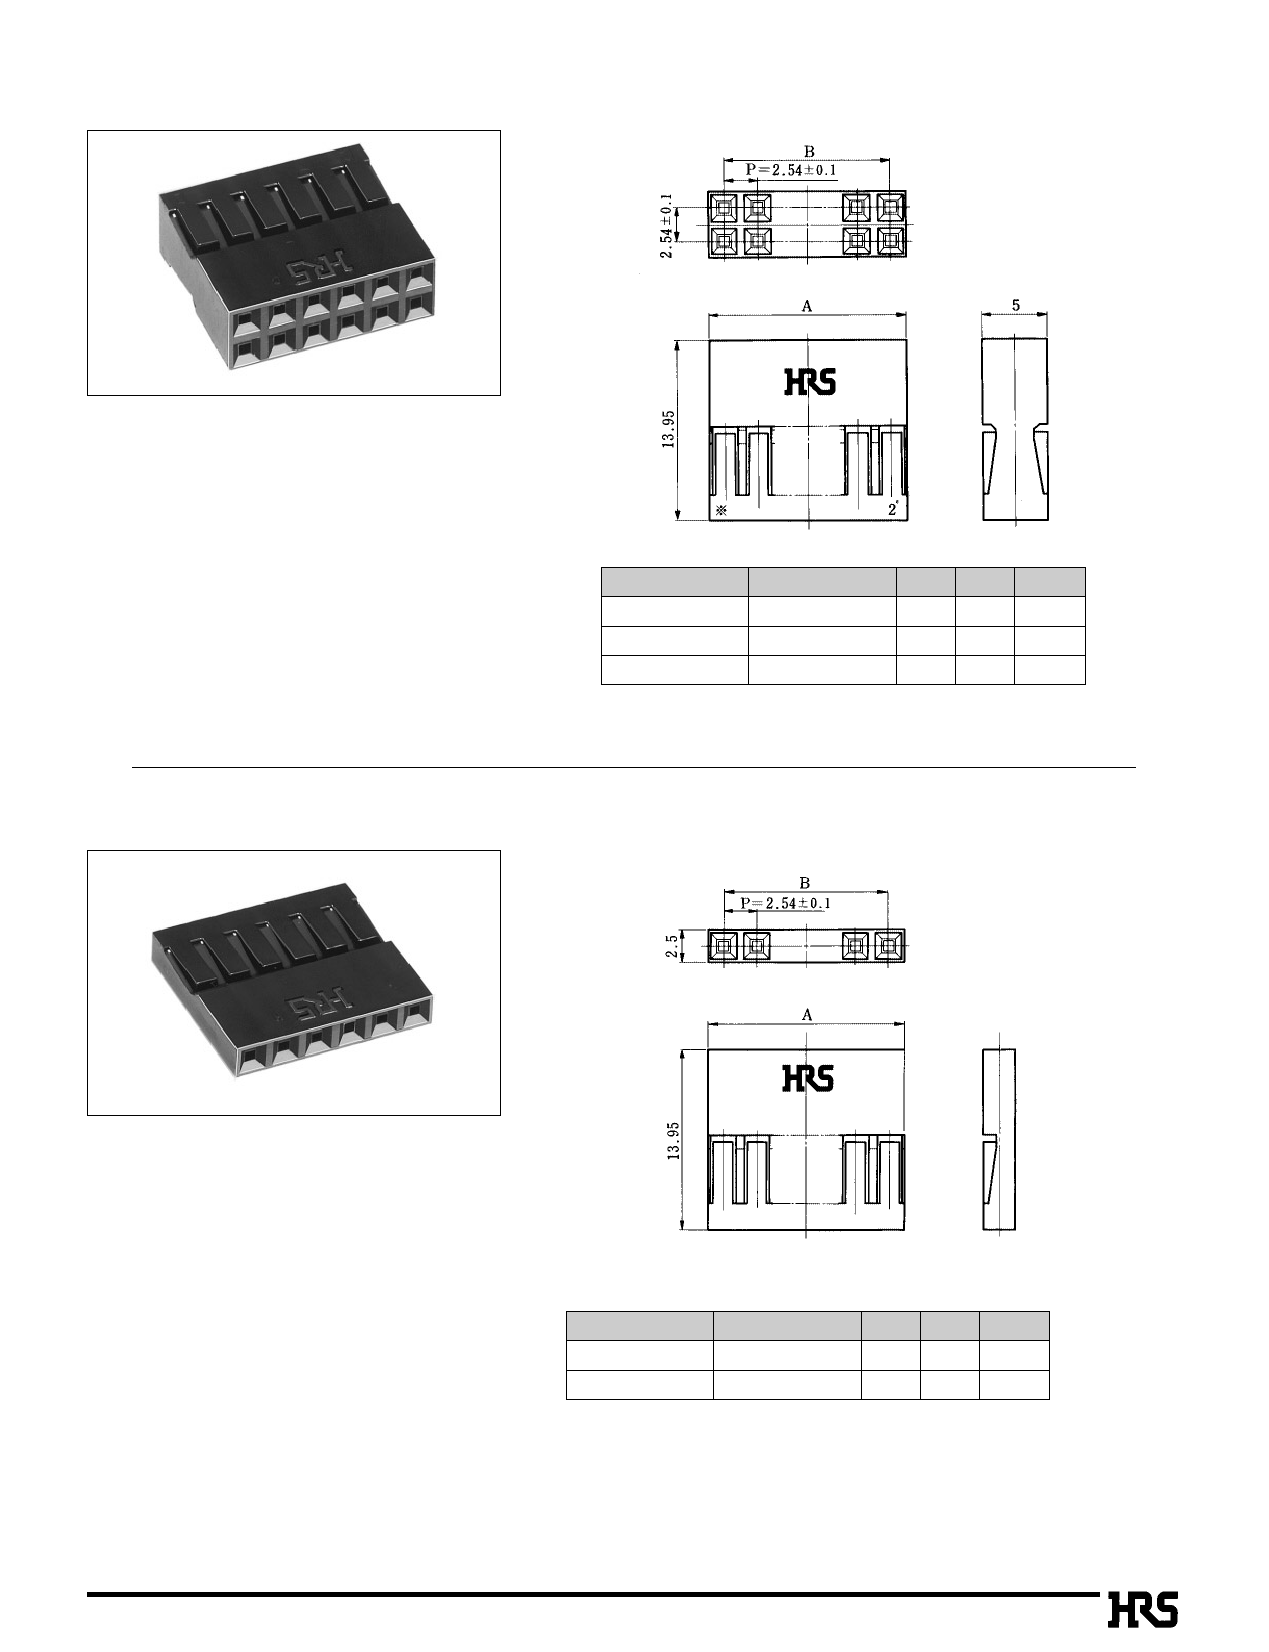 A1-10PA-2.54DS 電子部品, 半導体